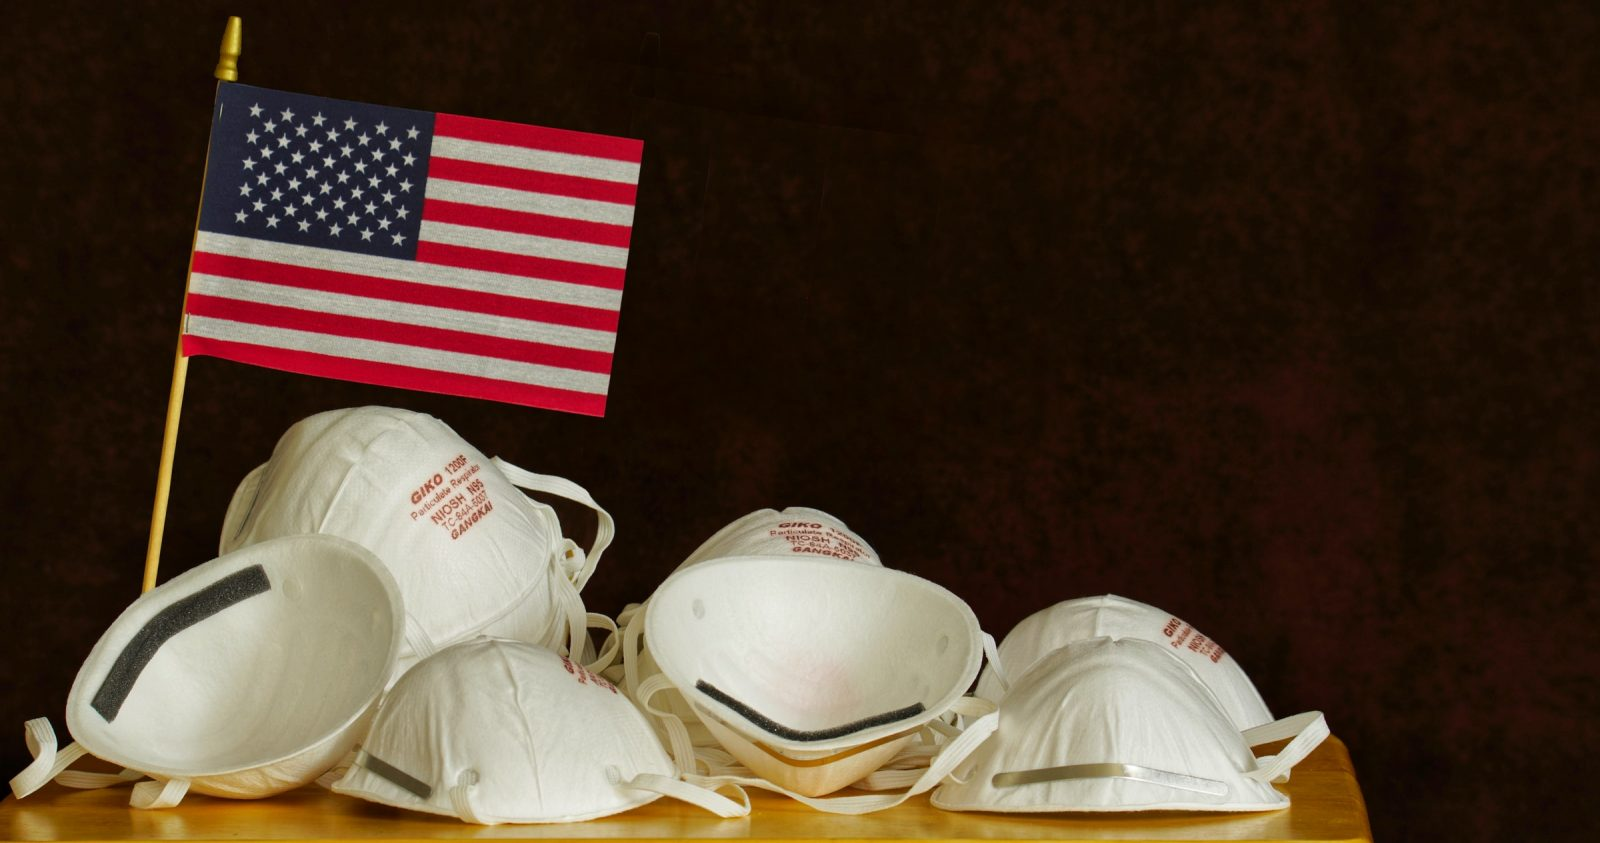 masks and a USA flag